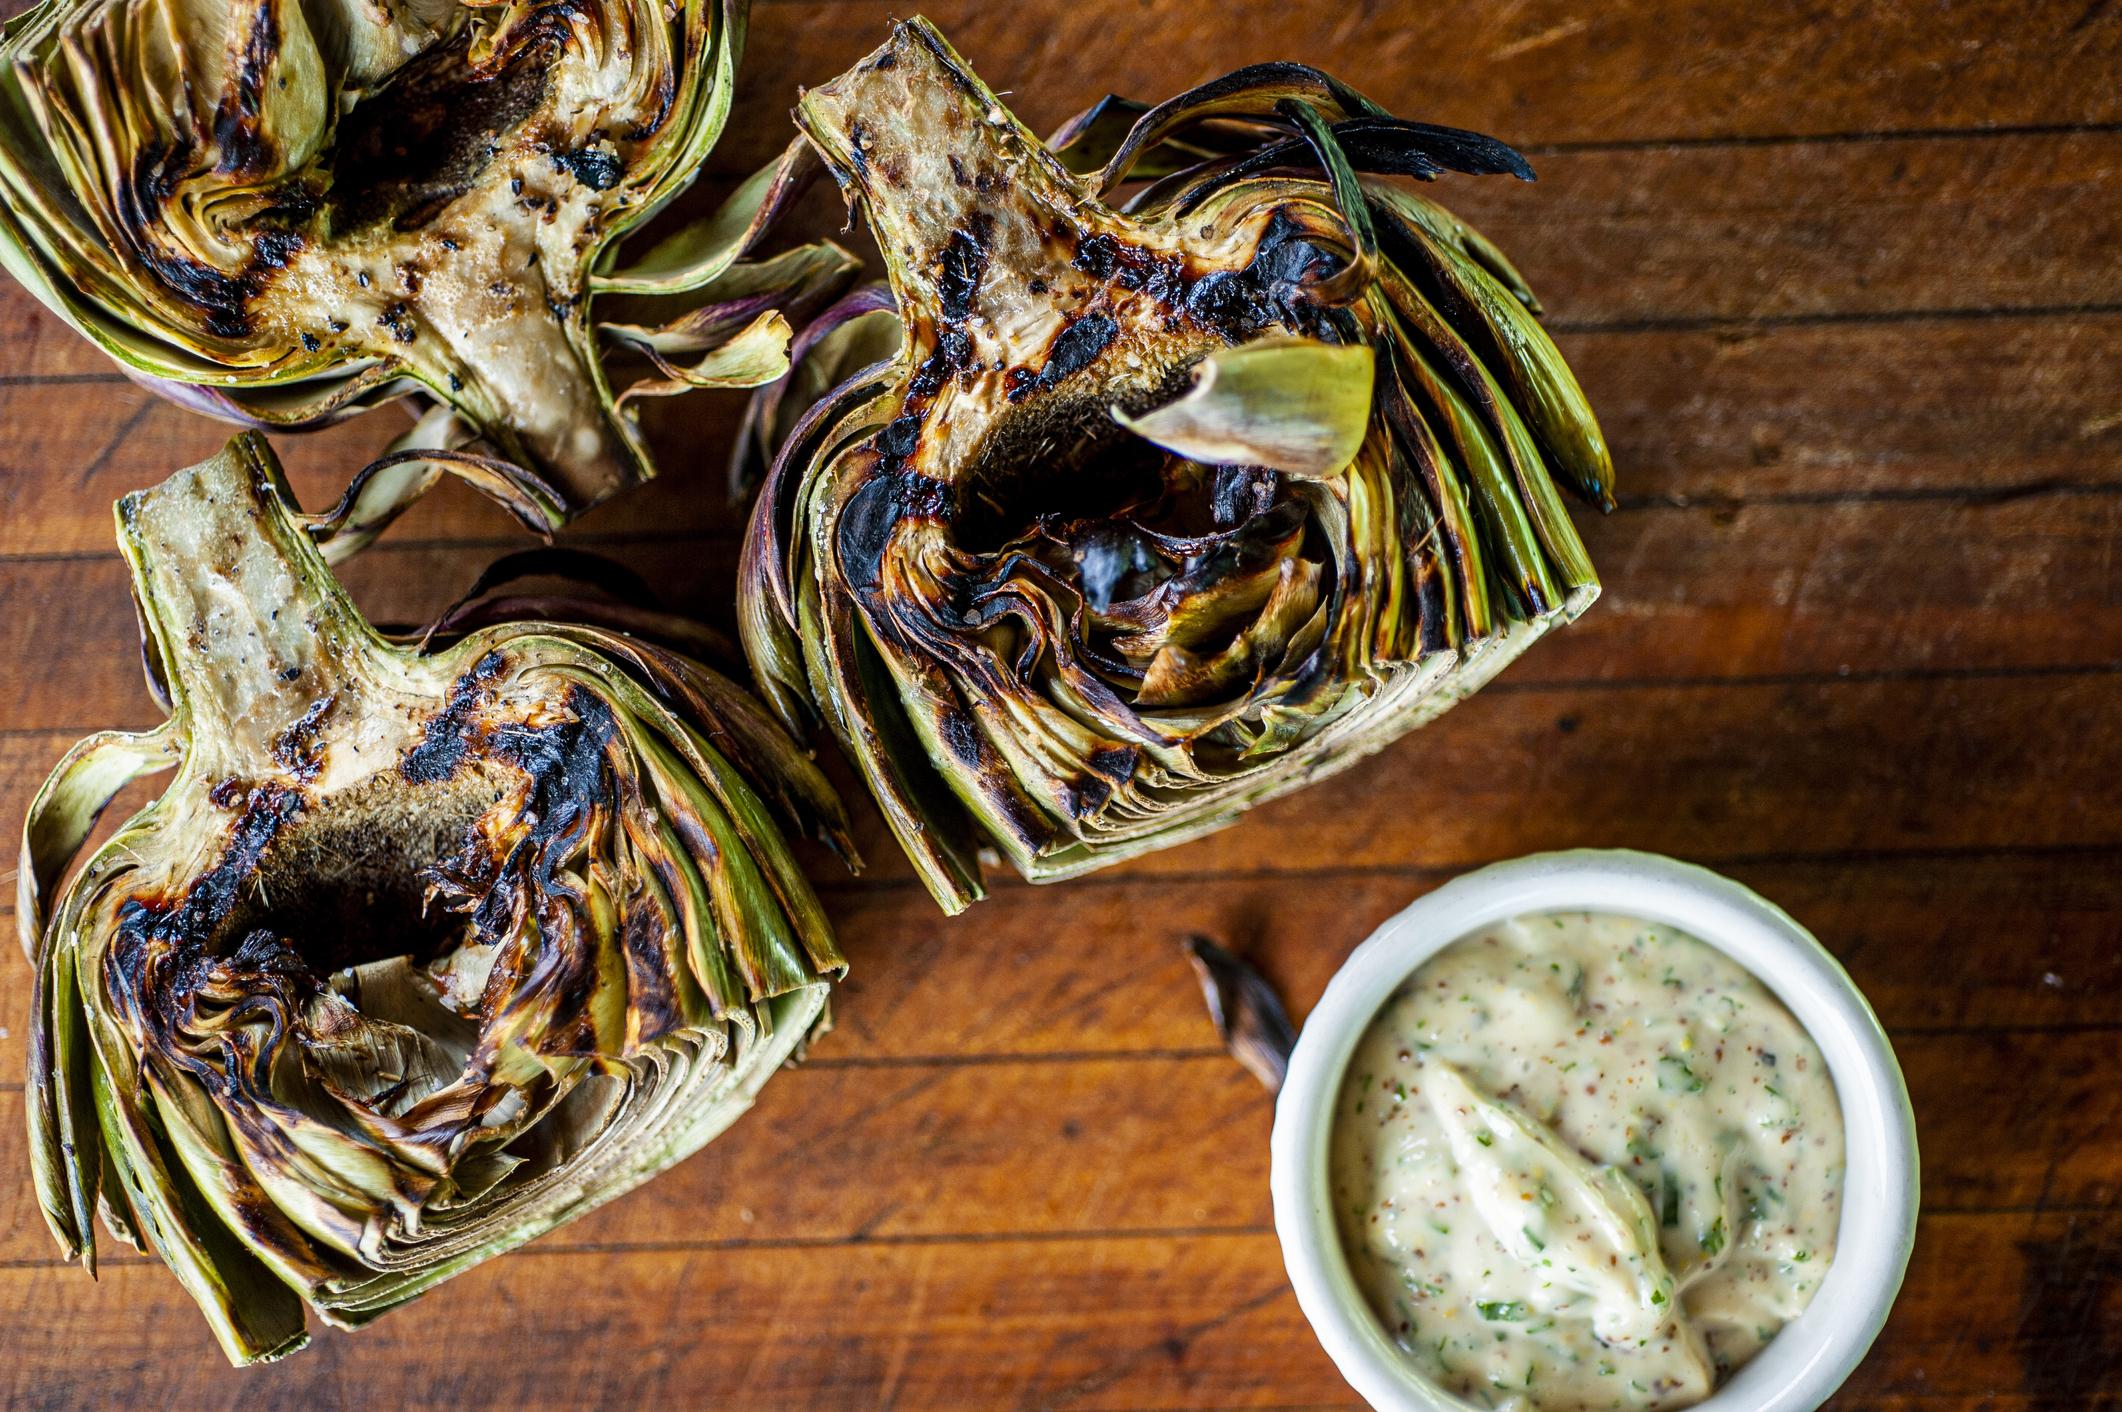 Grilled Garlic Tarragon Artichokes